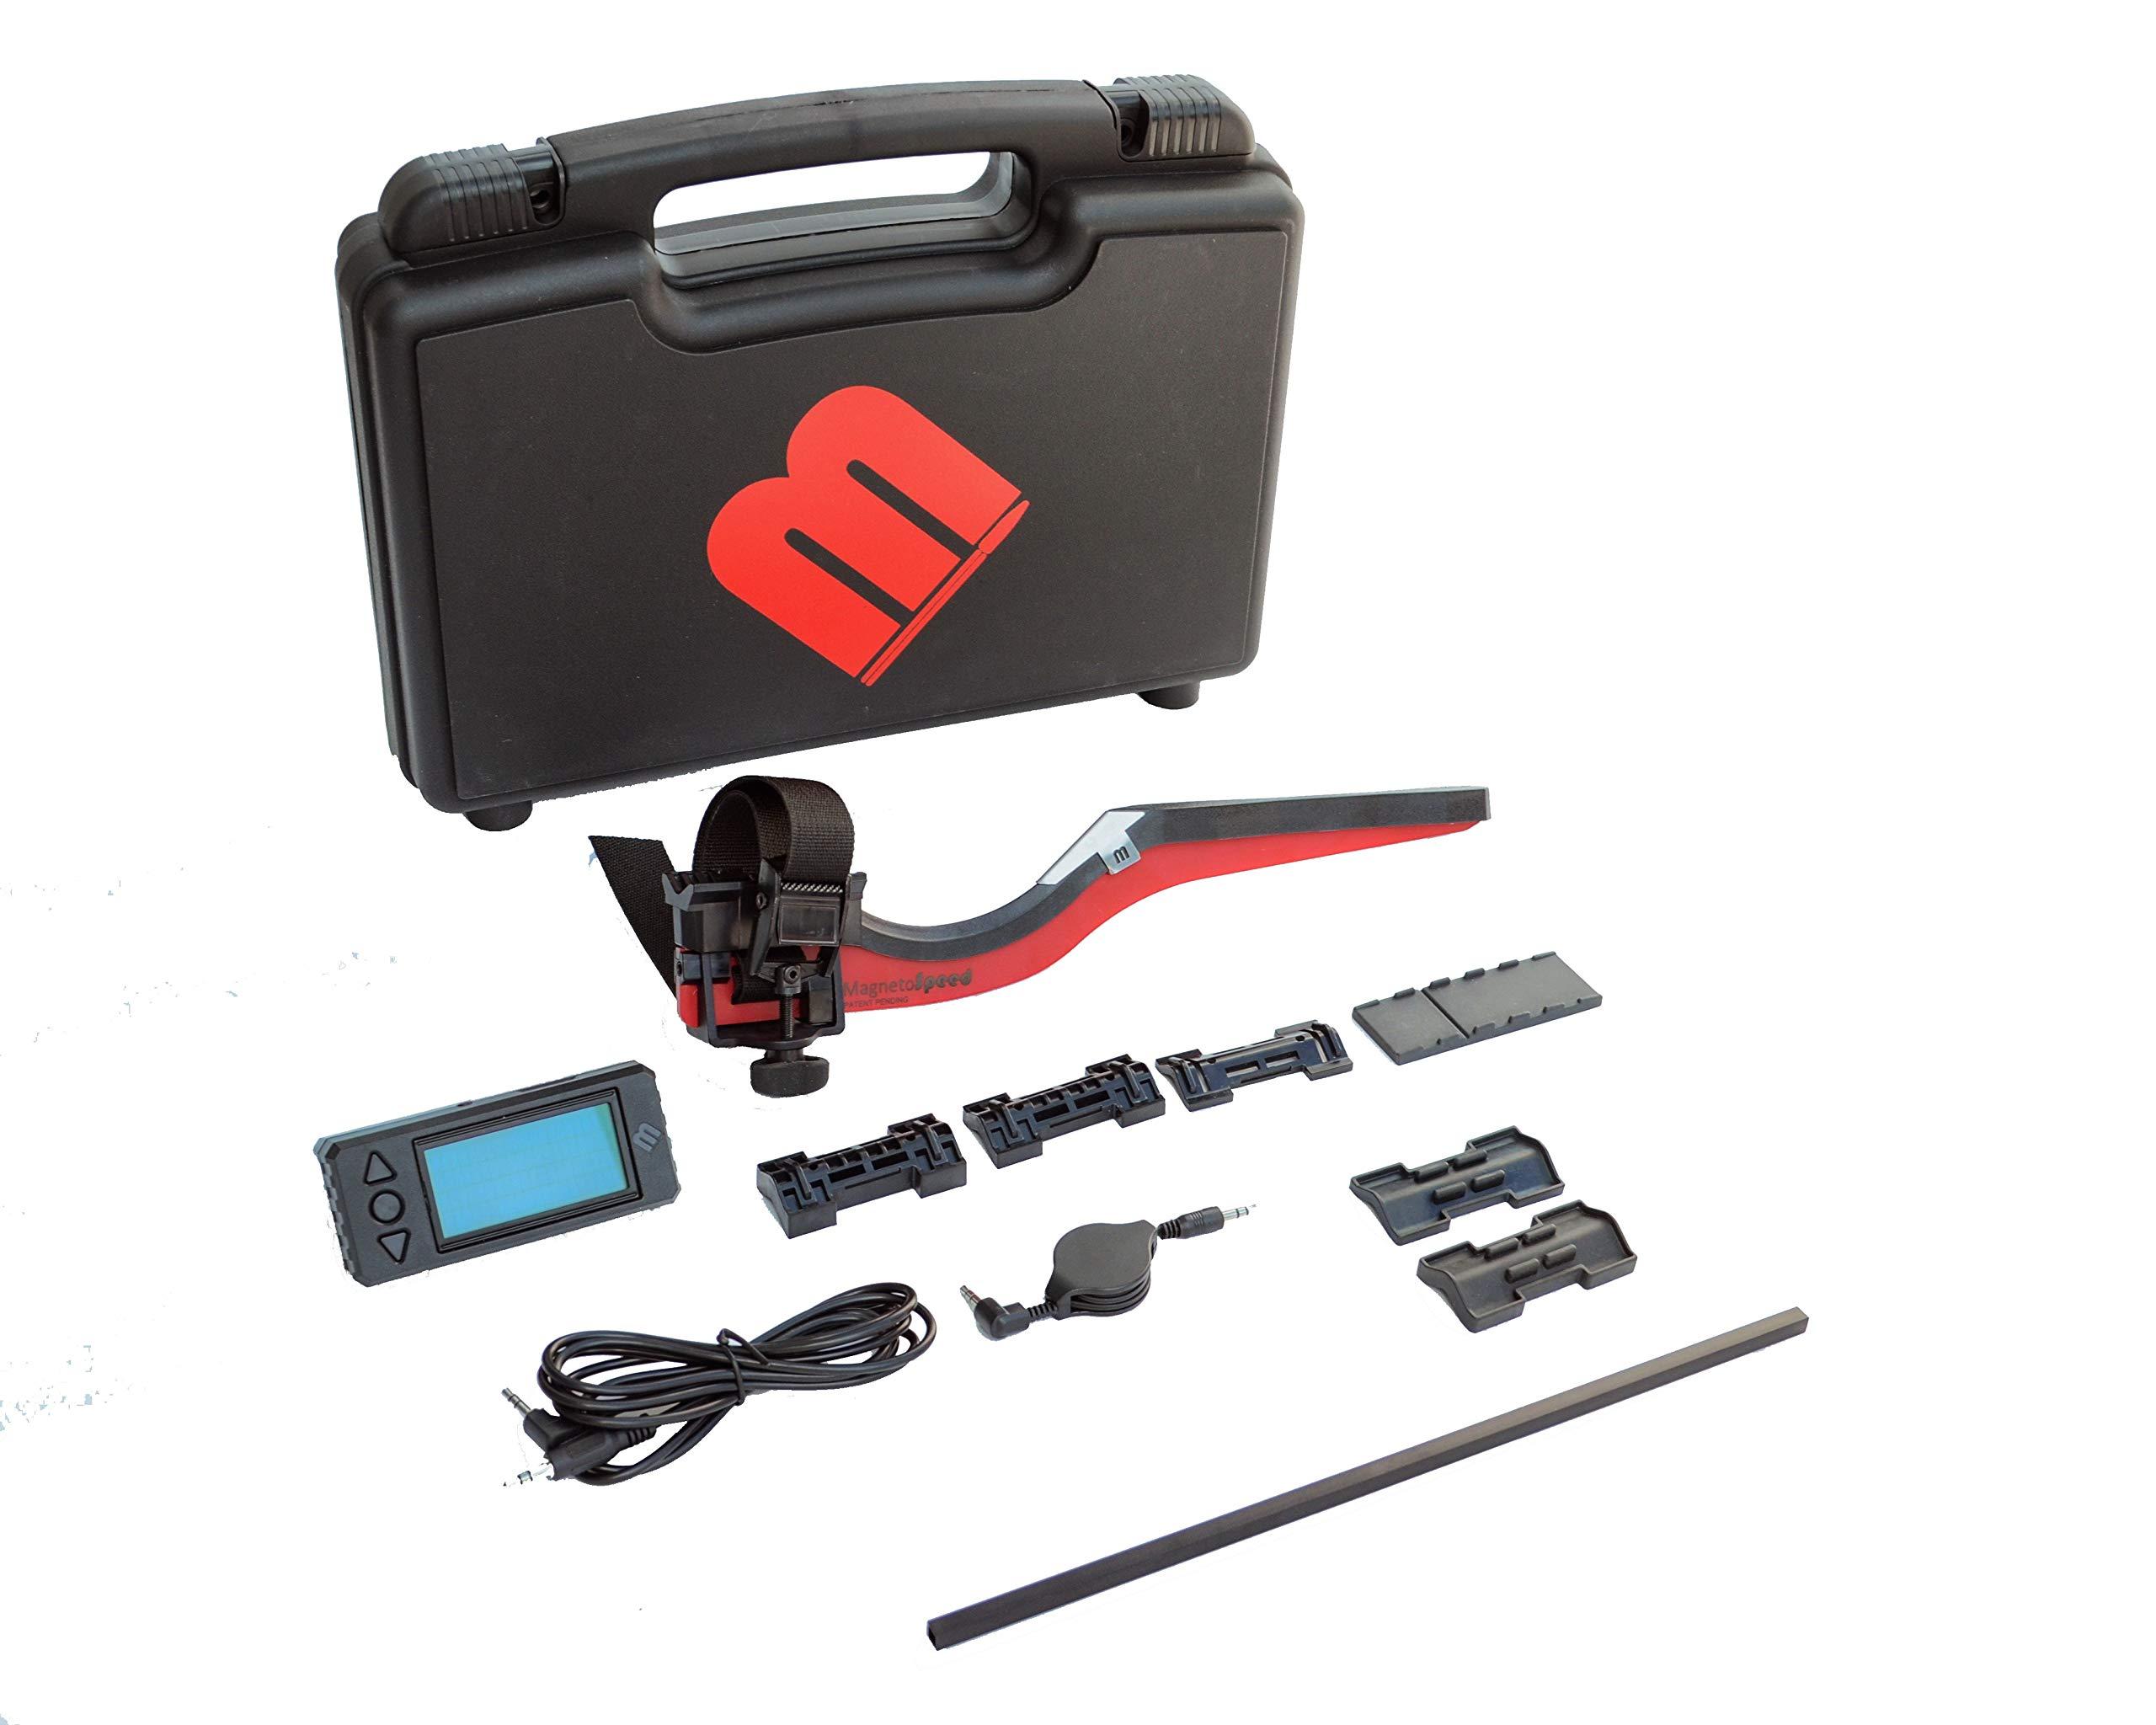 MagnetoSpeed V3 Barrel-Mounted Ballistics Chronograph Kit, Black, Hardcase by MagnetoSpeed